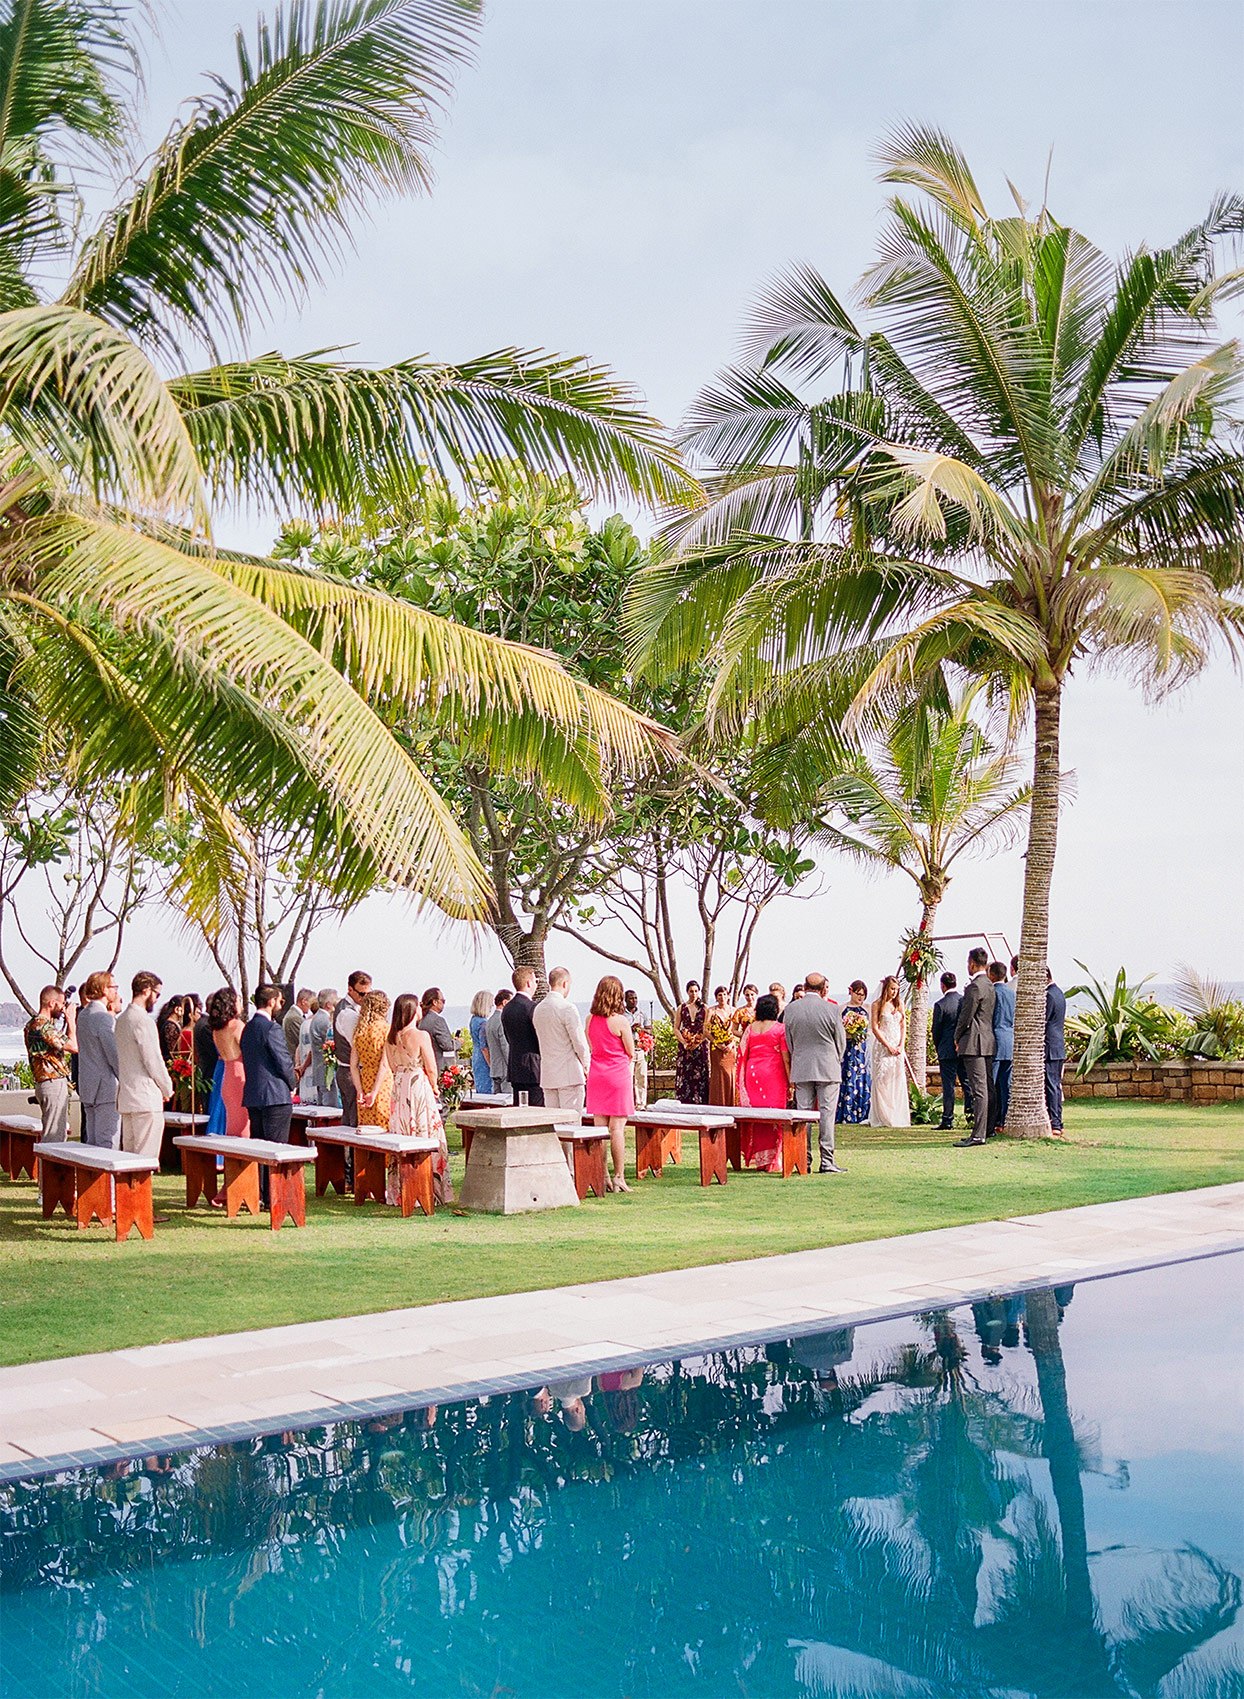 kelly sanjiv wedding ceremony under palm trees